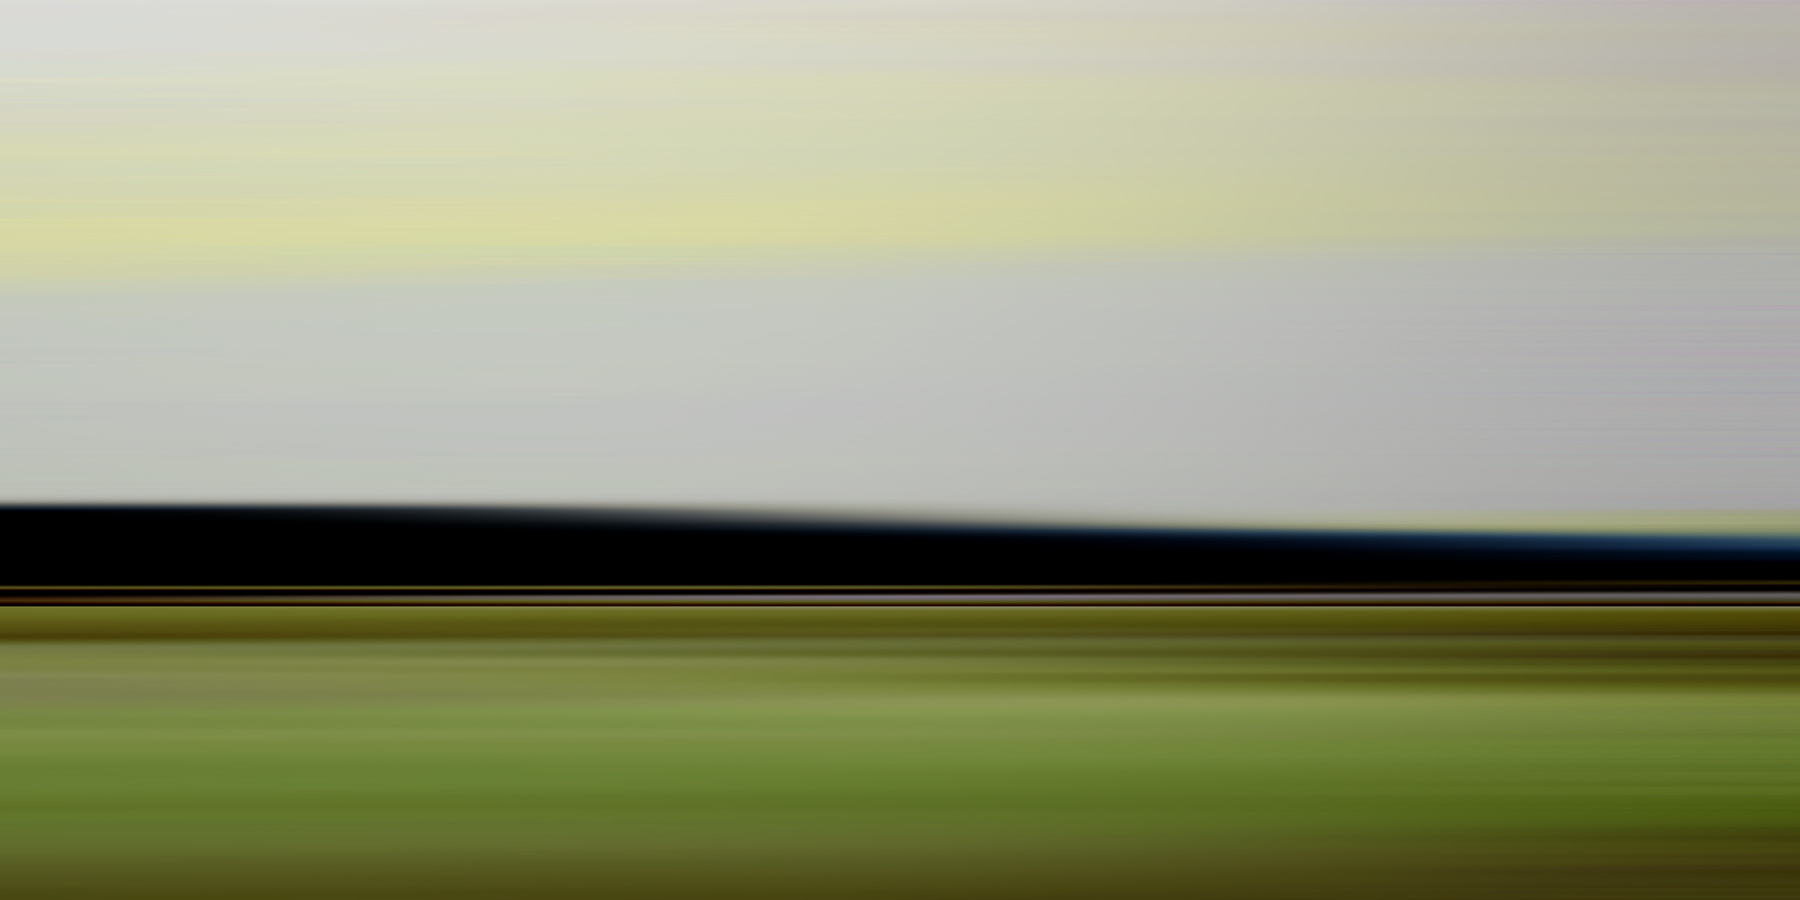 Green Field at Dusk